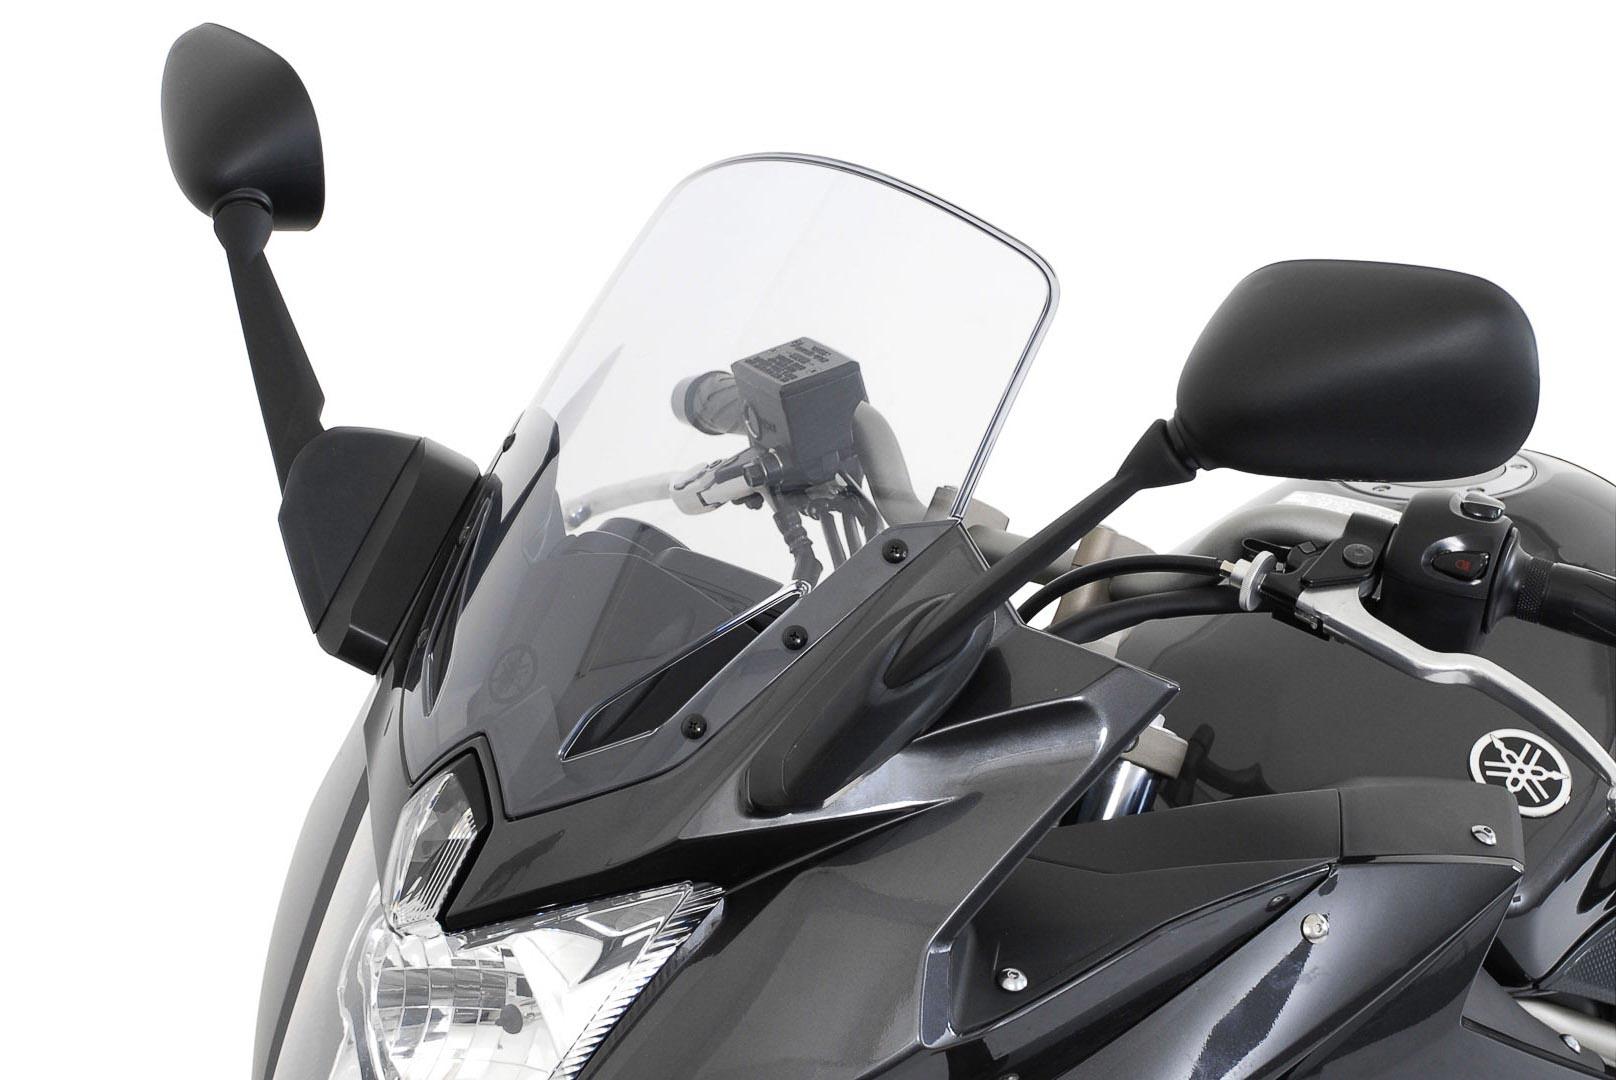 SW-Motech Peilinlevike Yamaha XJ-6 Diversion 09-